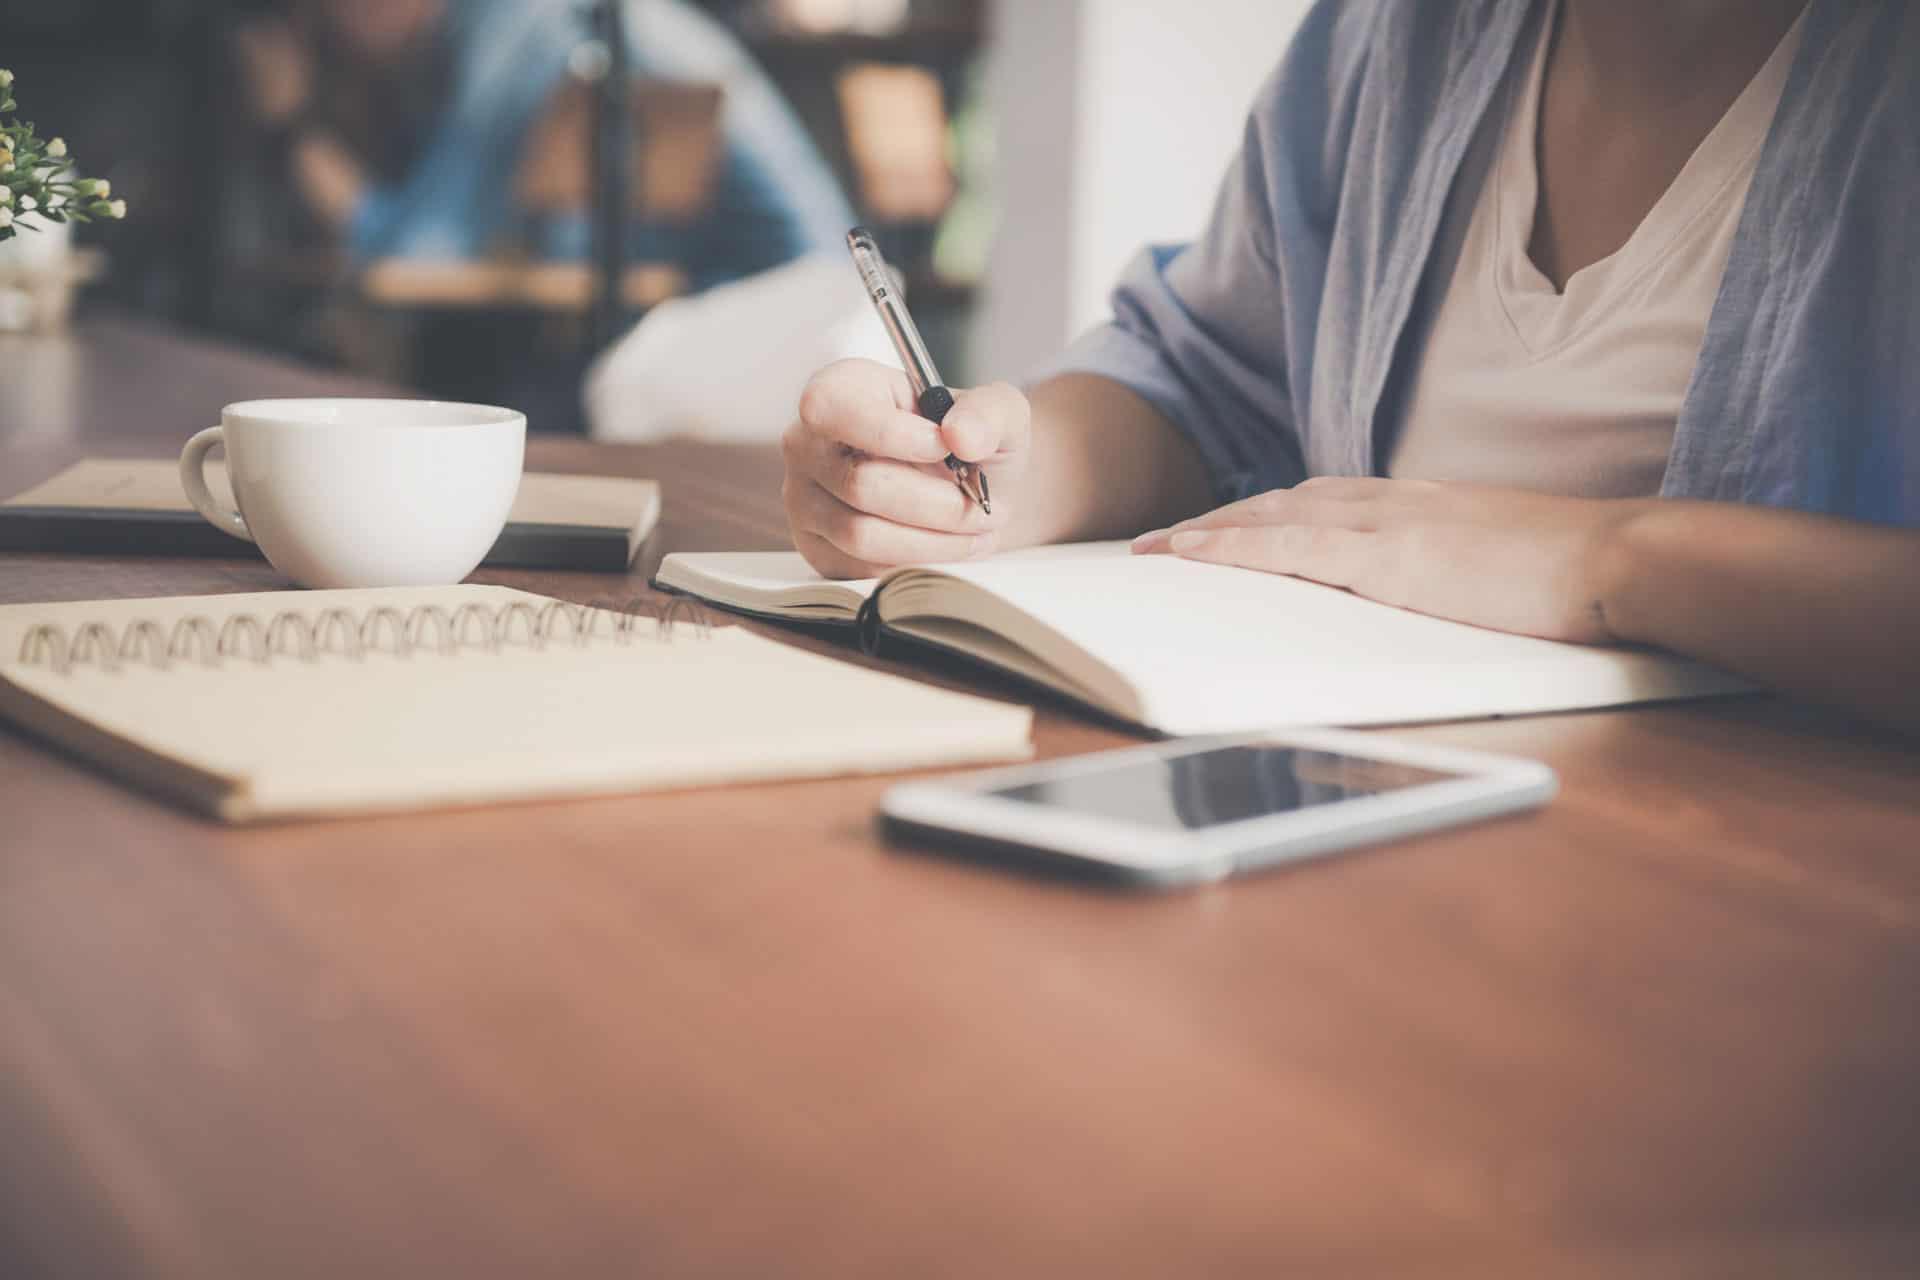 Schüler am Schreibtisch beim Lernen